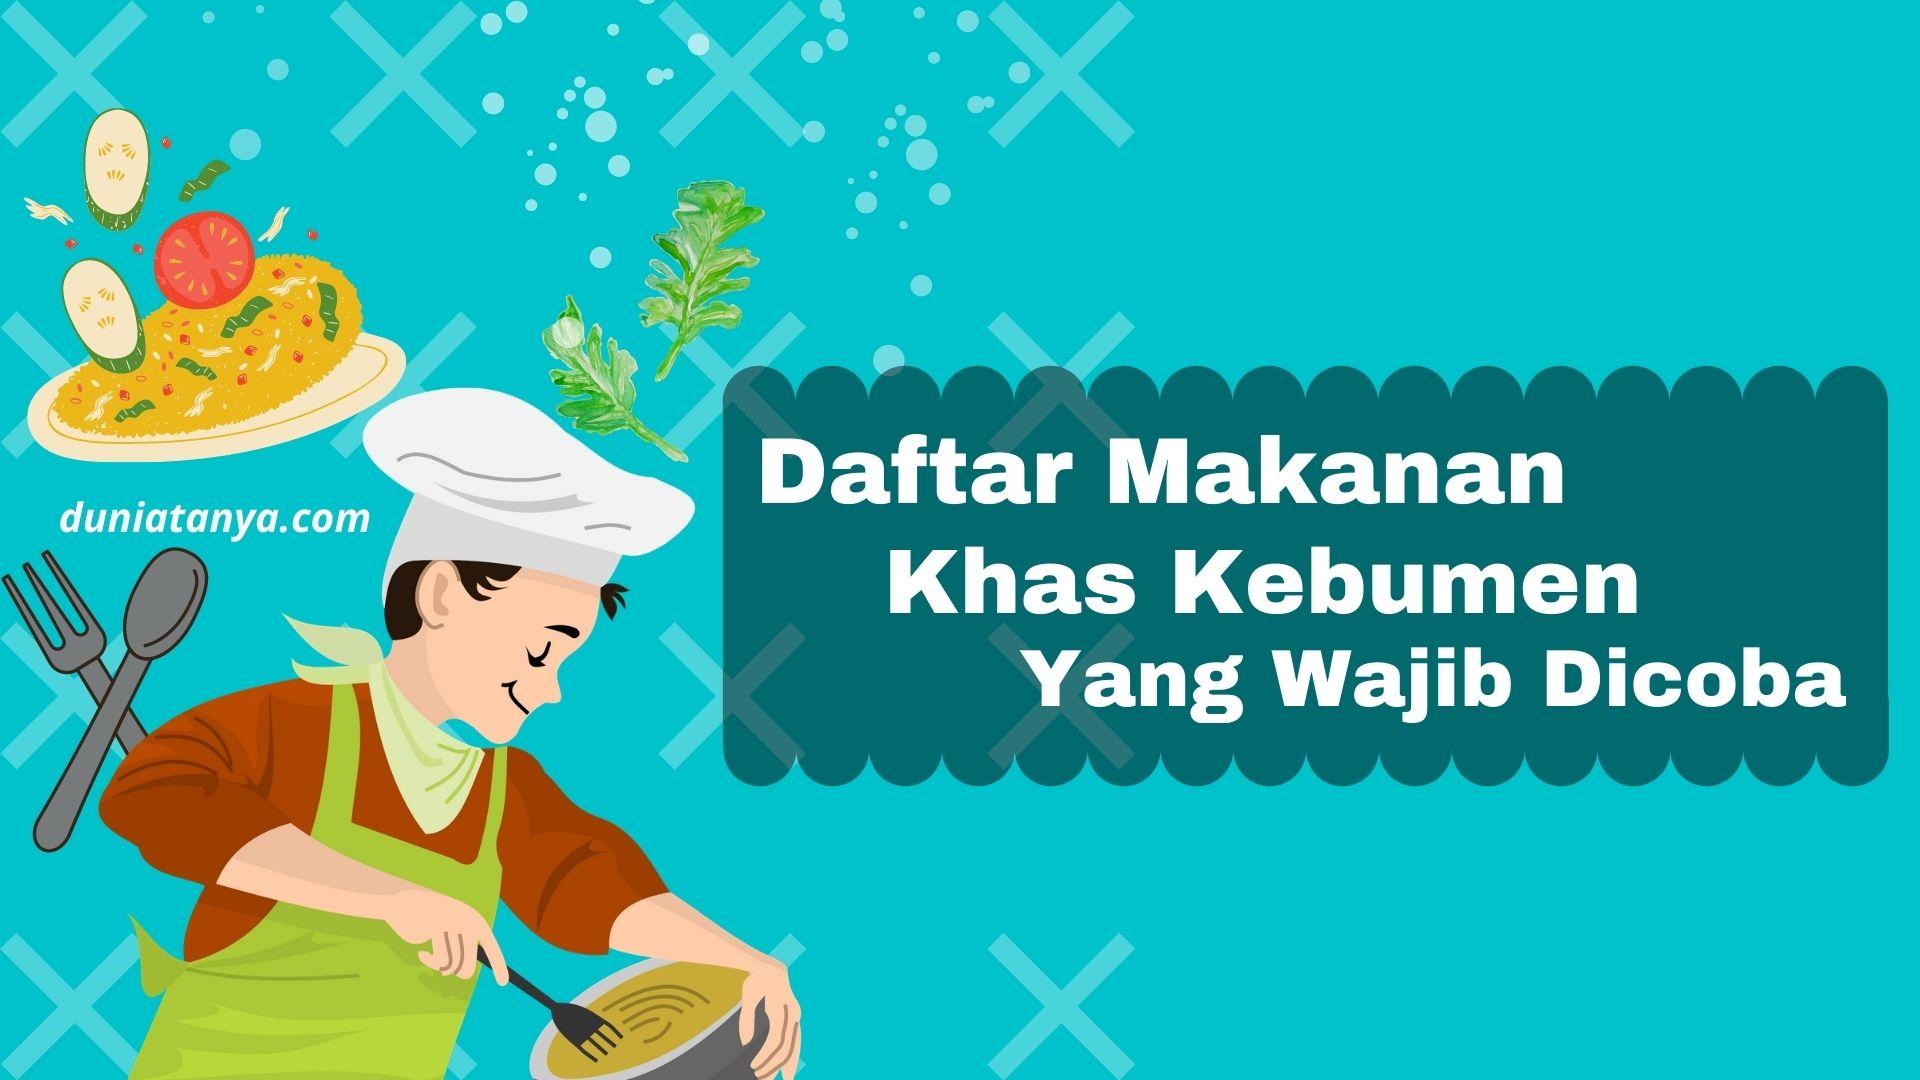 You are currently viewing Daftar Makanan Khas Kebumen Yang Wajib Dicoba